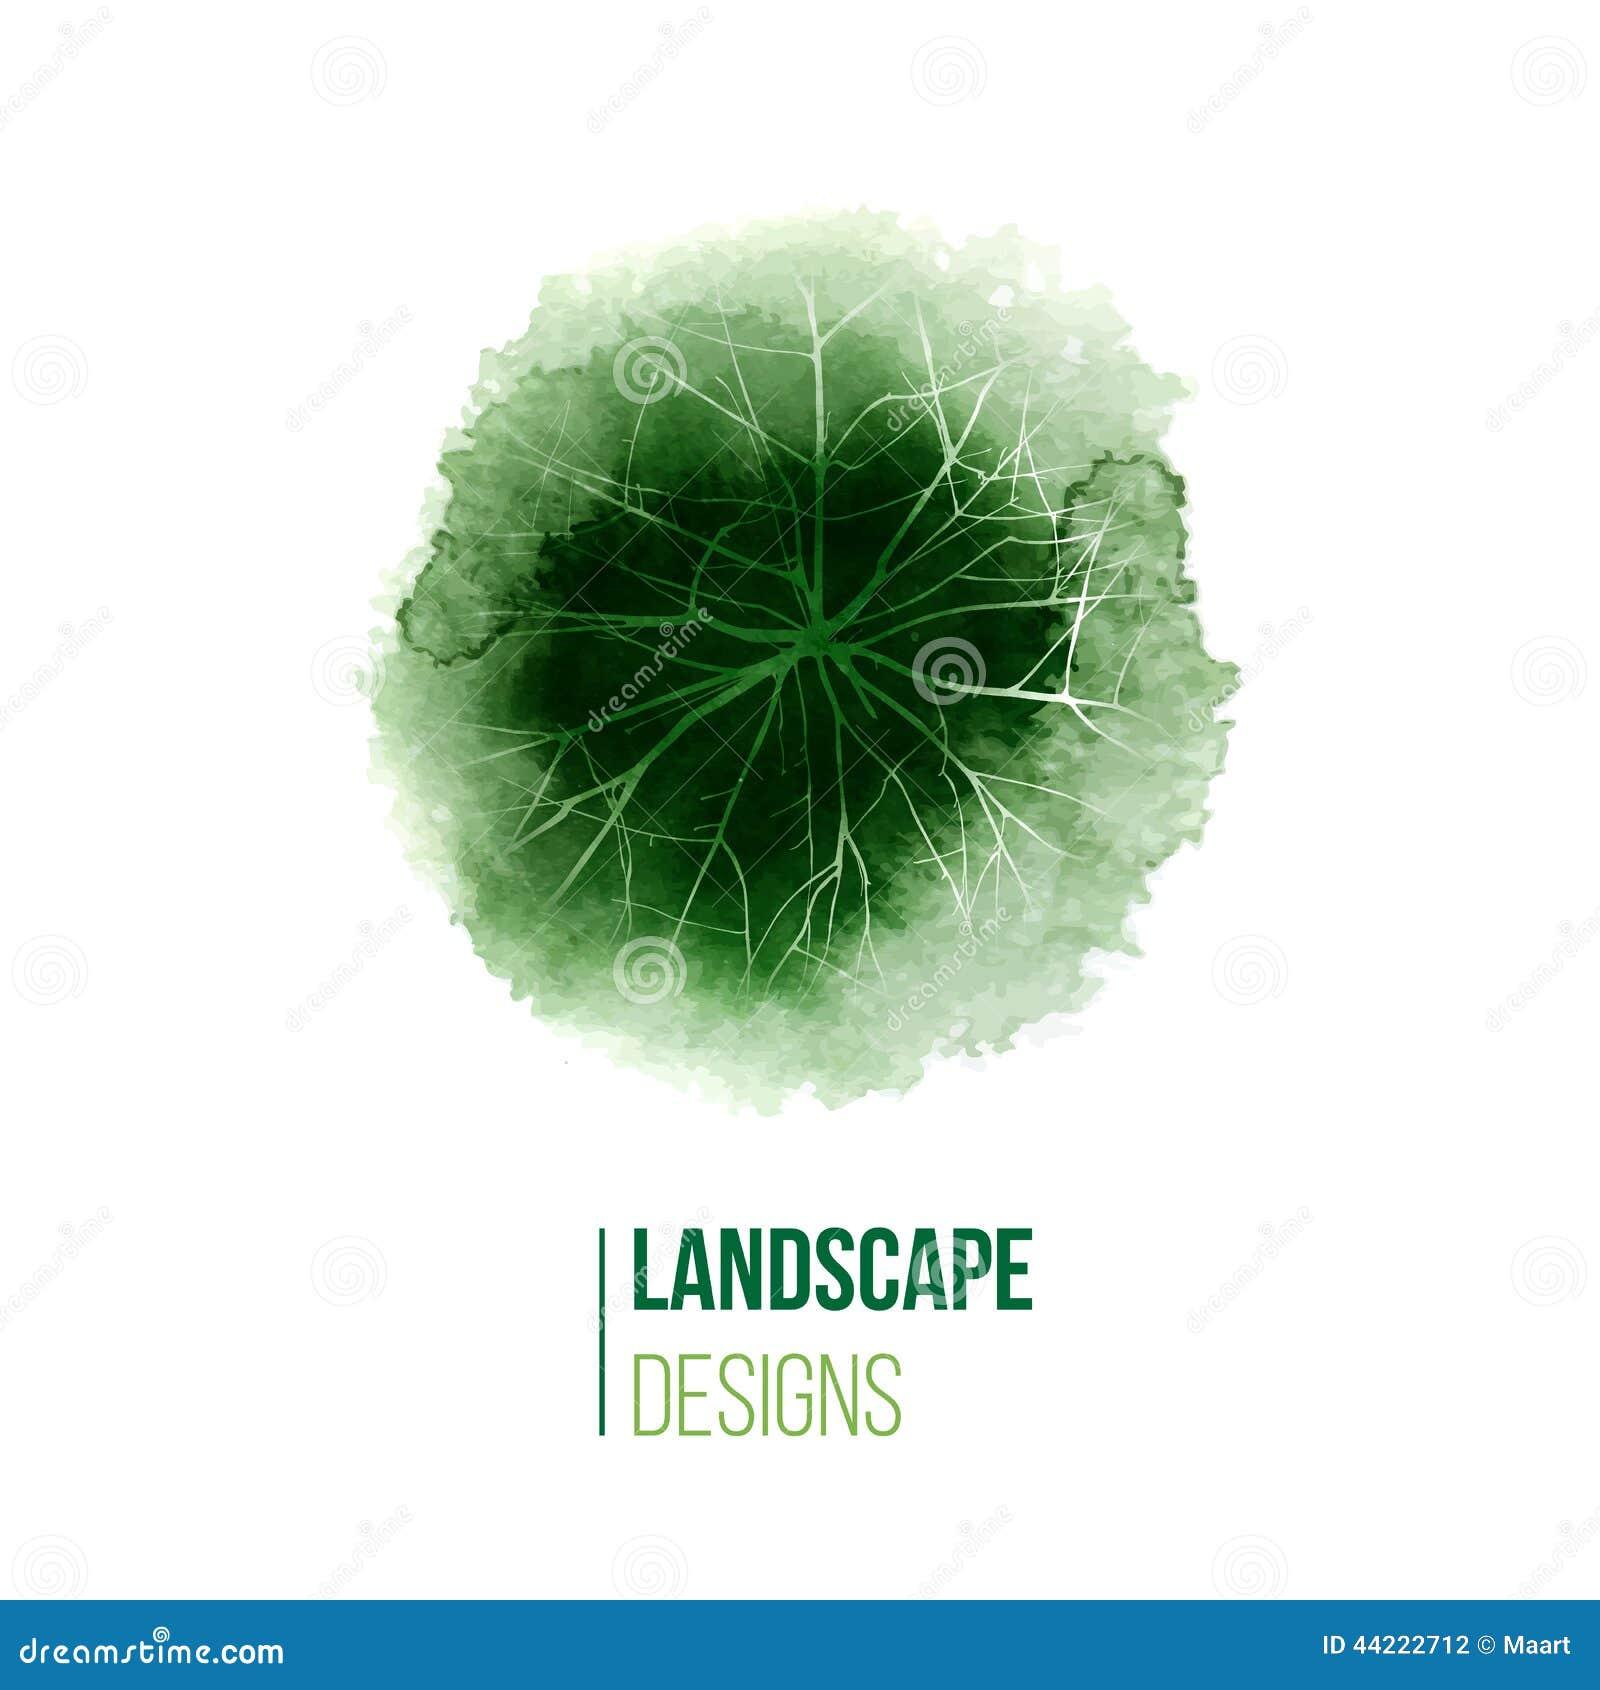 Hand drawn landscape design logo stock vector image for Landscape design logo